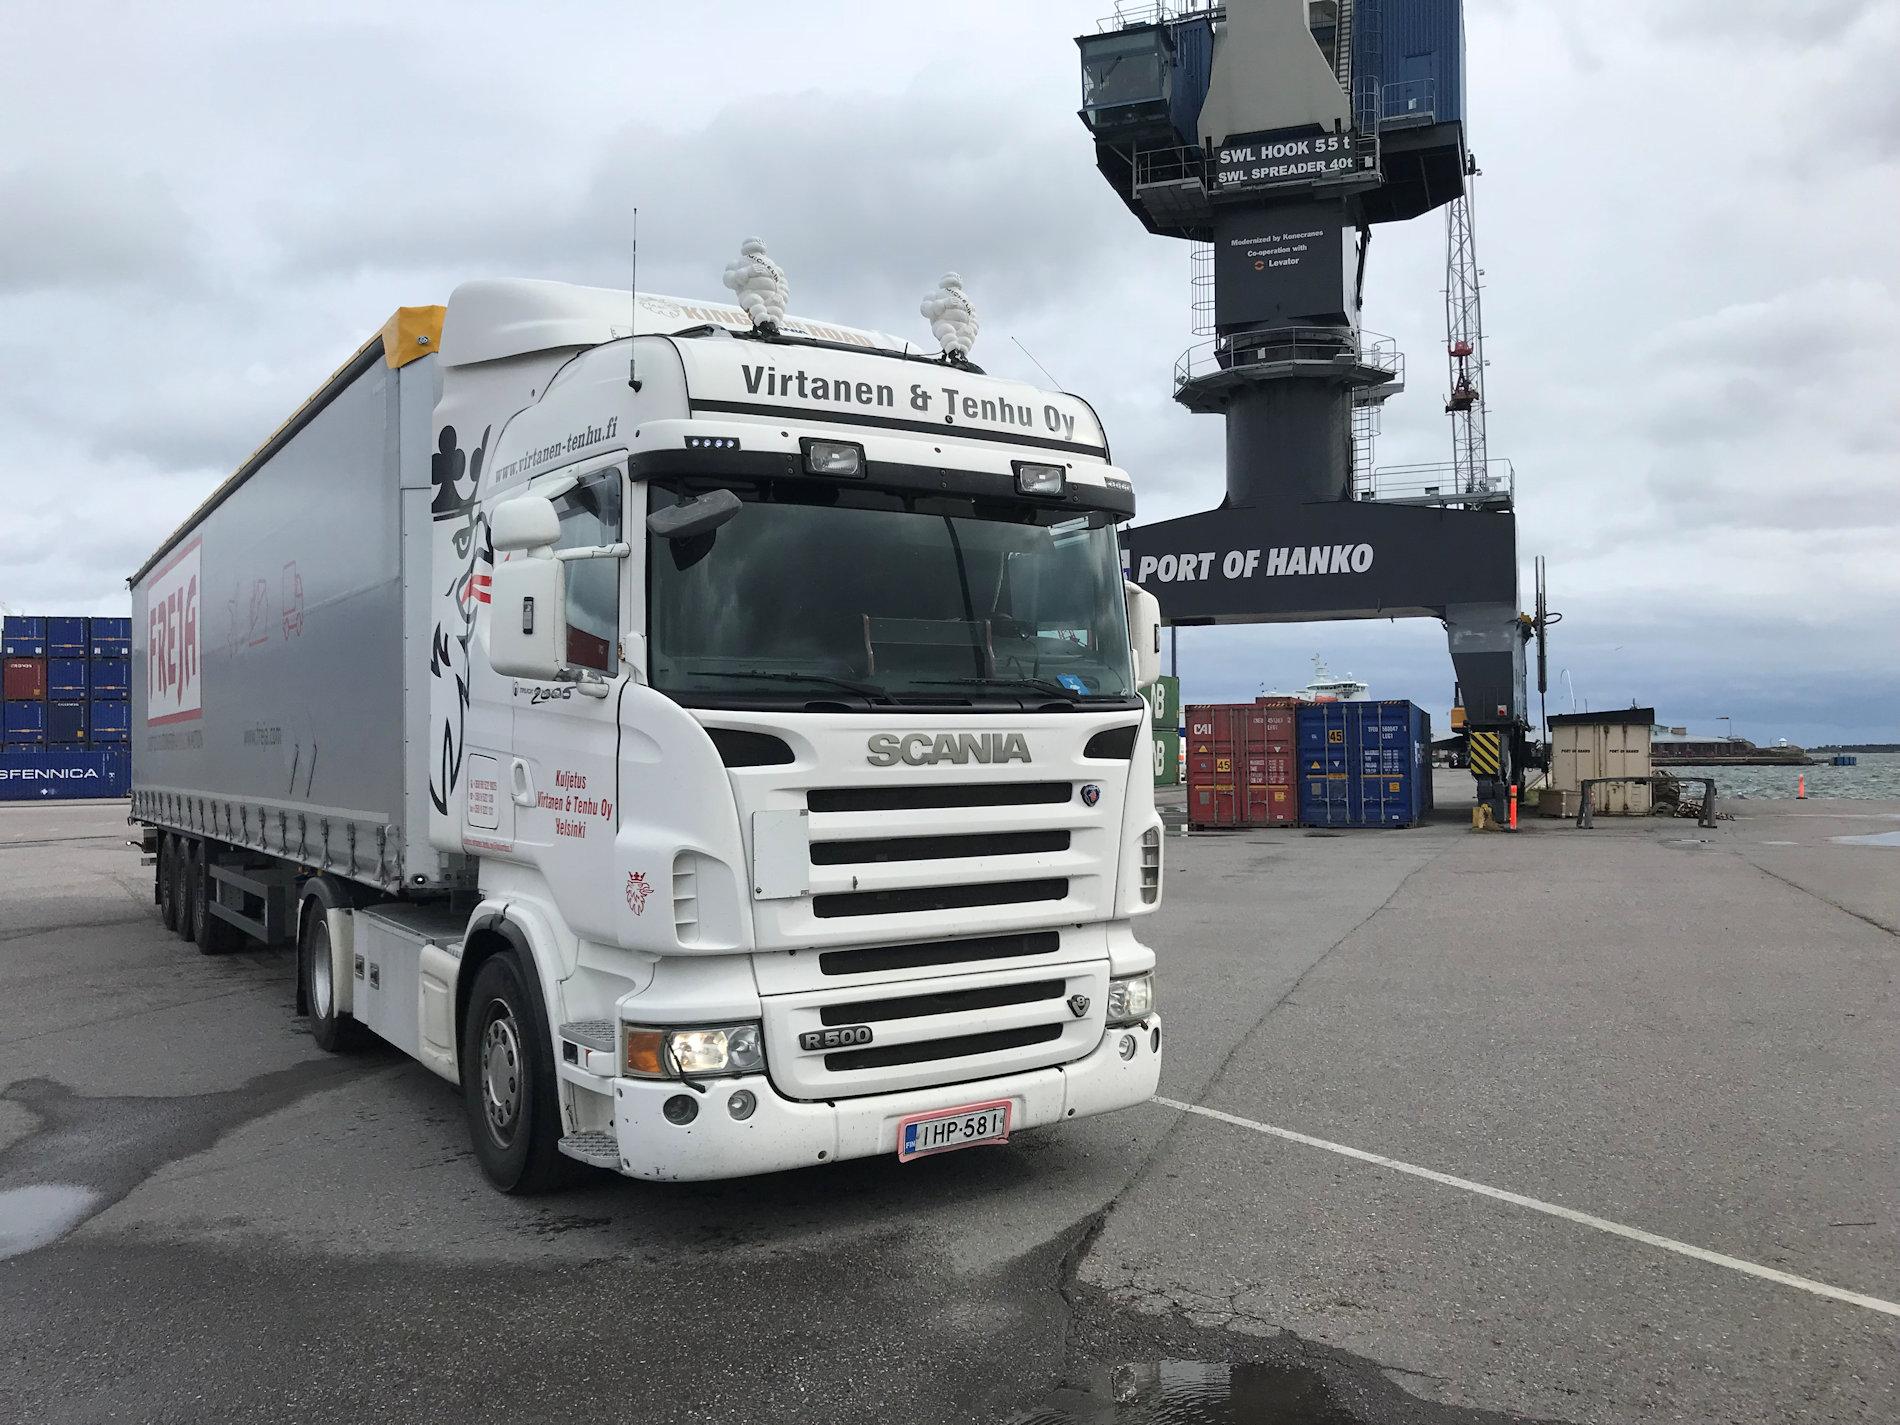 Kuljetus Virtanen & Tenhu Oy